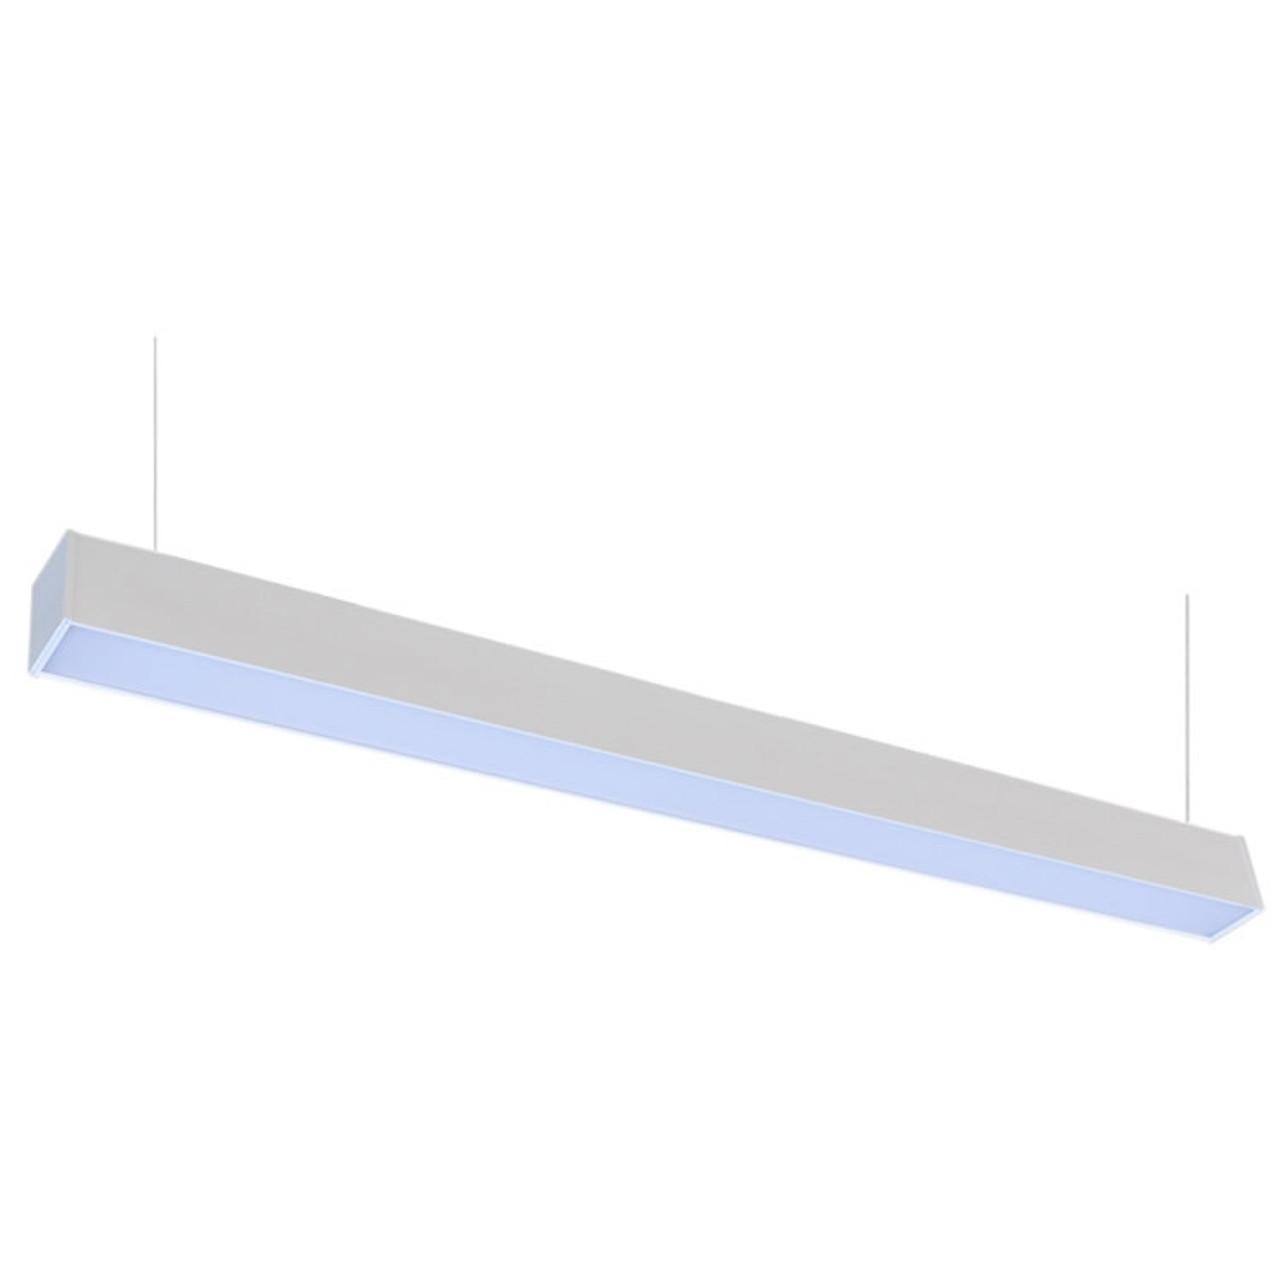 suspended linear led office lighting 4 ft office hanging light linkable